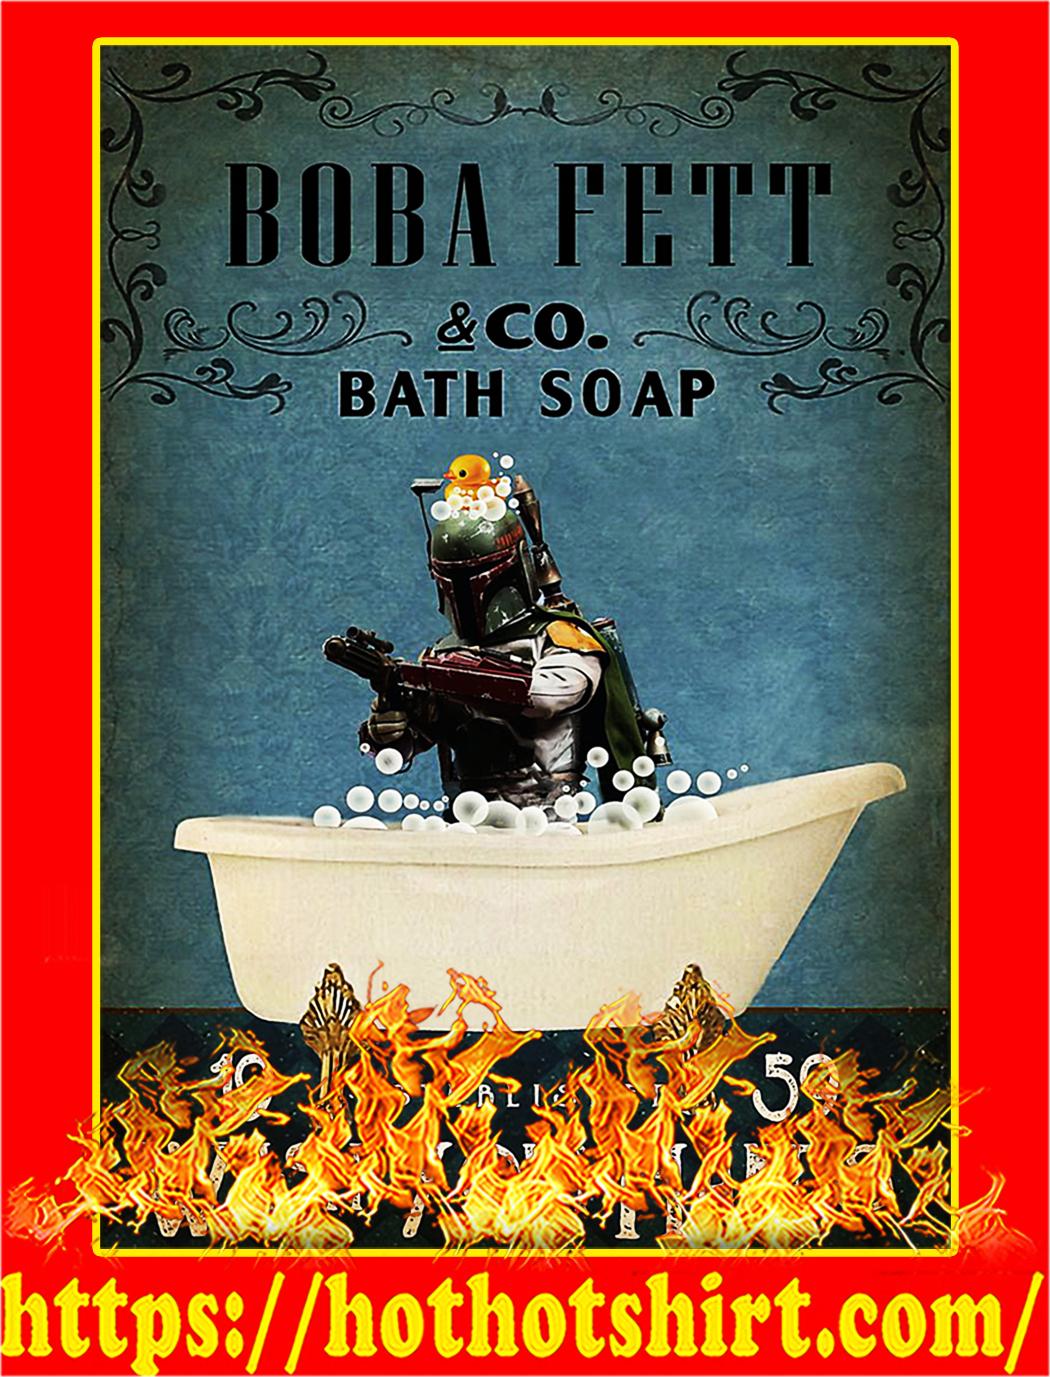 Bath soap company boba bett wash your hands poster - A1